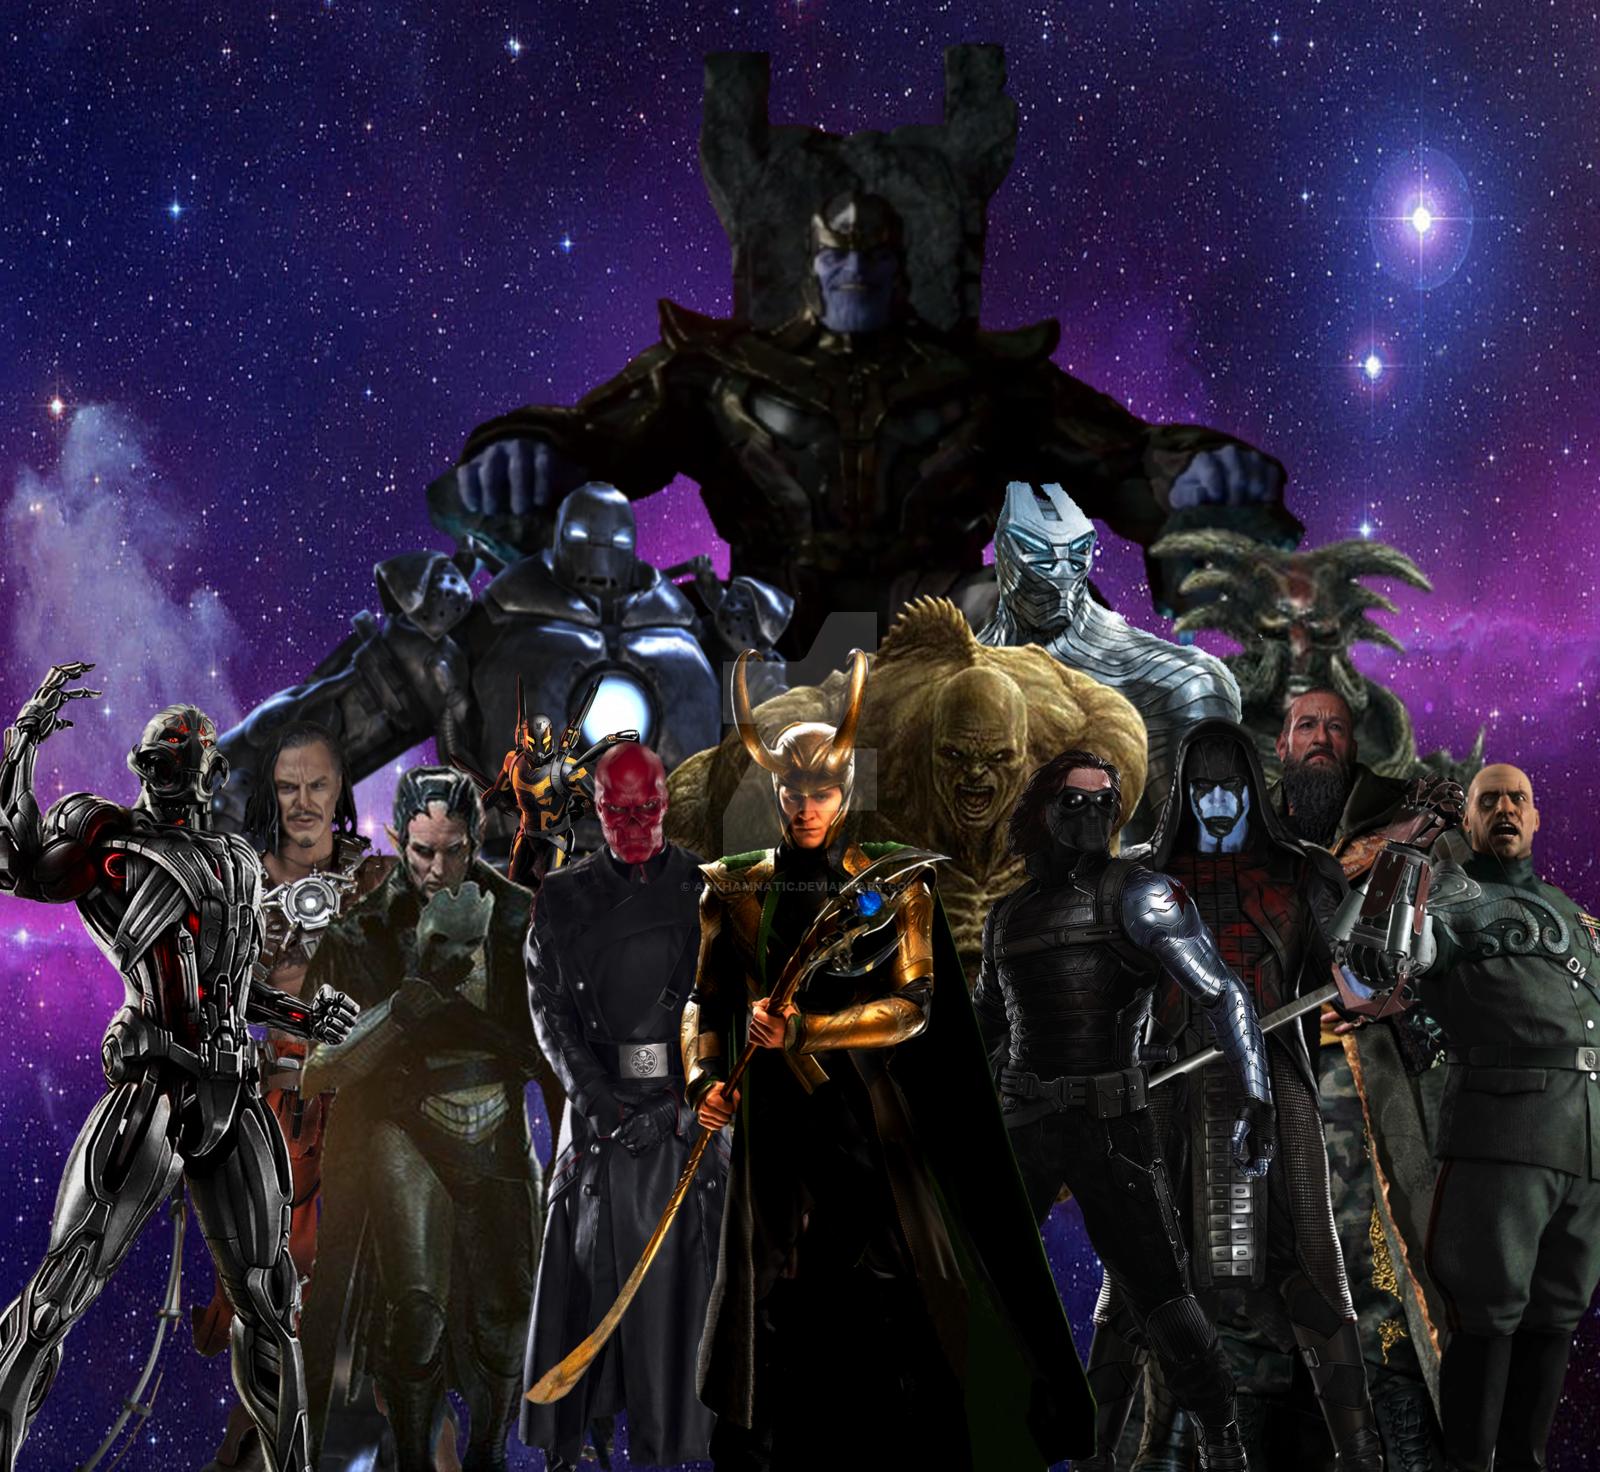 Marvel Cinematic Universe villains by ArkhamNatic on 1600x1472